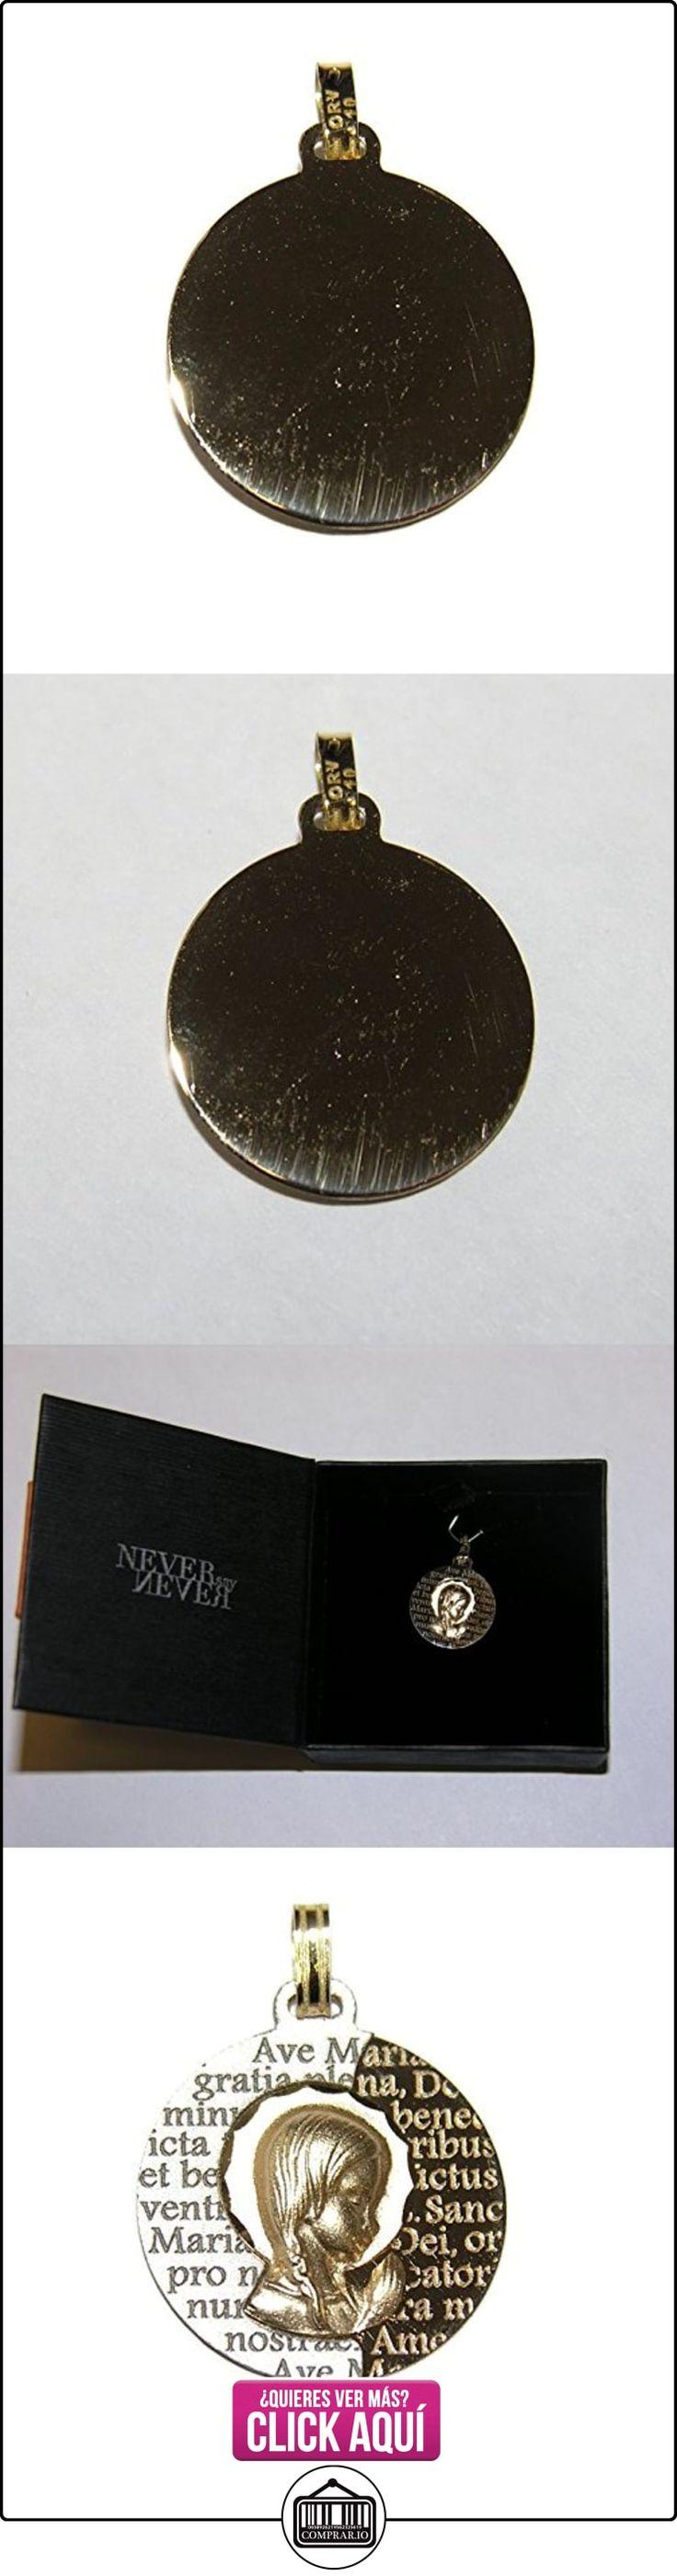 Medalla de comunión Virgen niña bicolor oro de 18k con oración del Ave María. 16mm  ✿ Joyas para niñas - Regalos ✿ ▬► Ver oferta: http://comprar.io/goto/B01NBYBPDQ